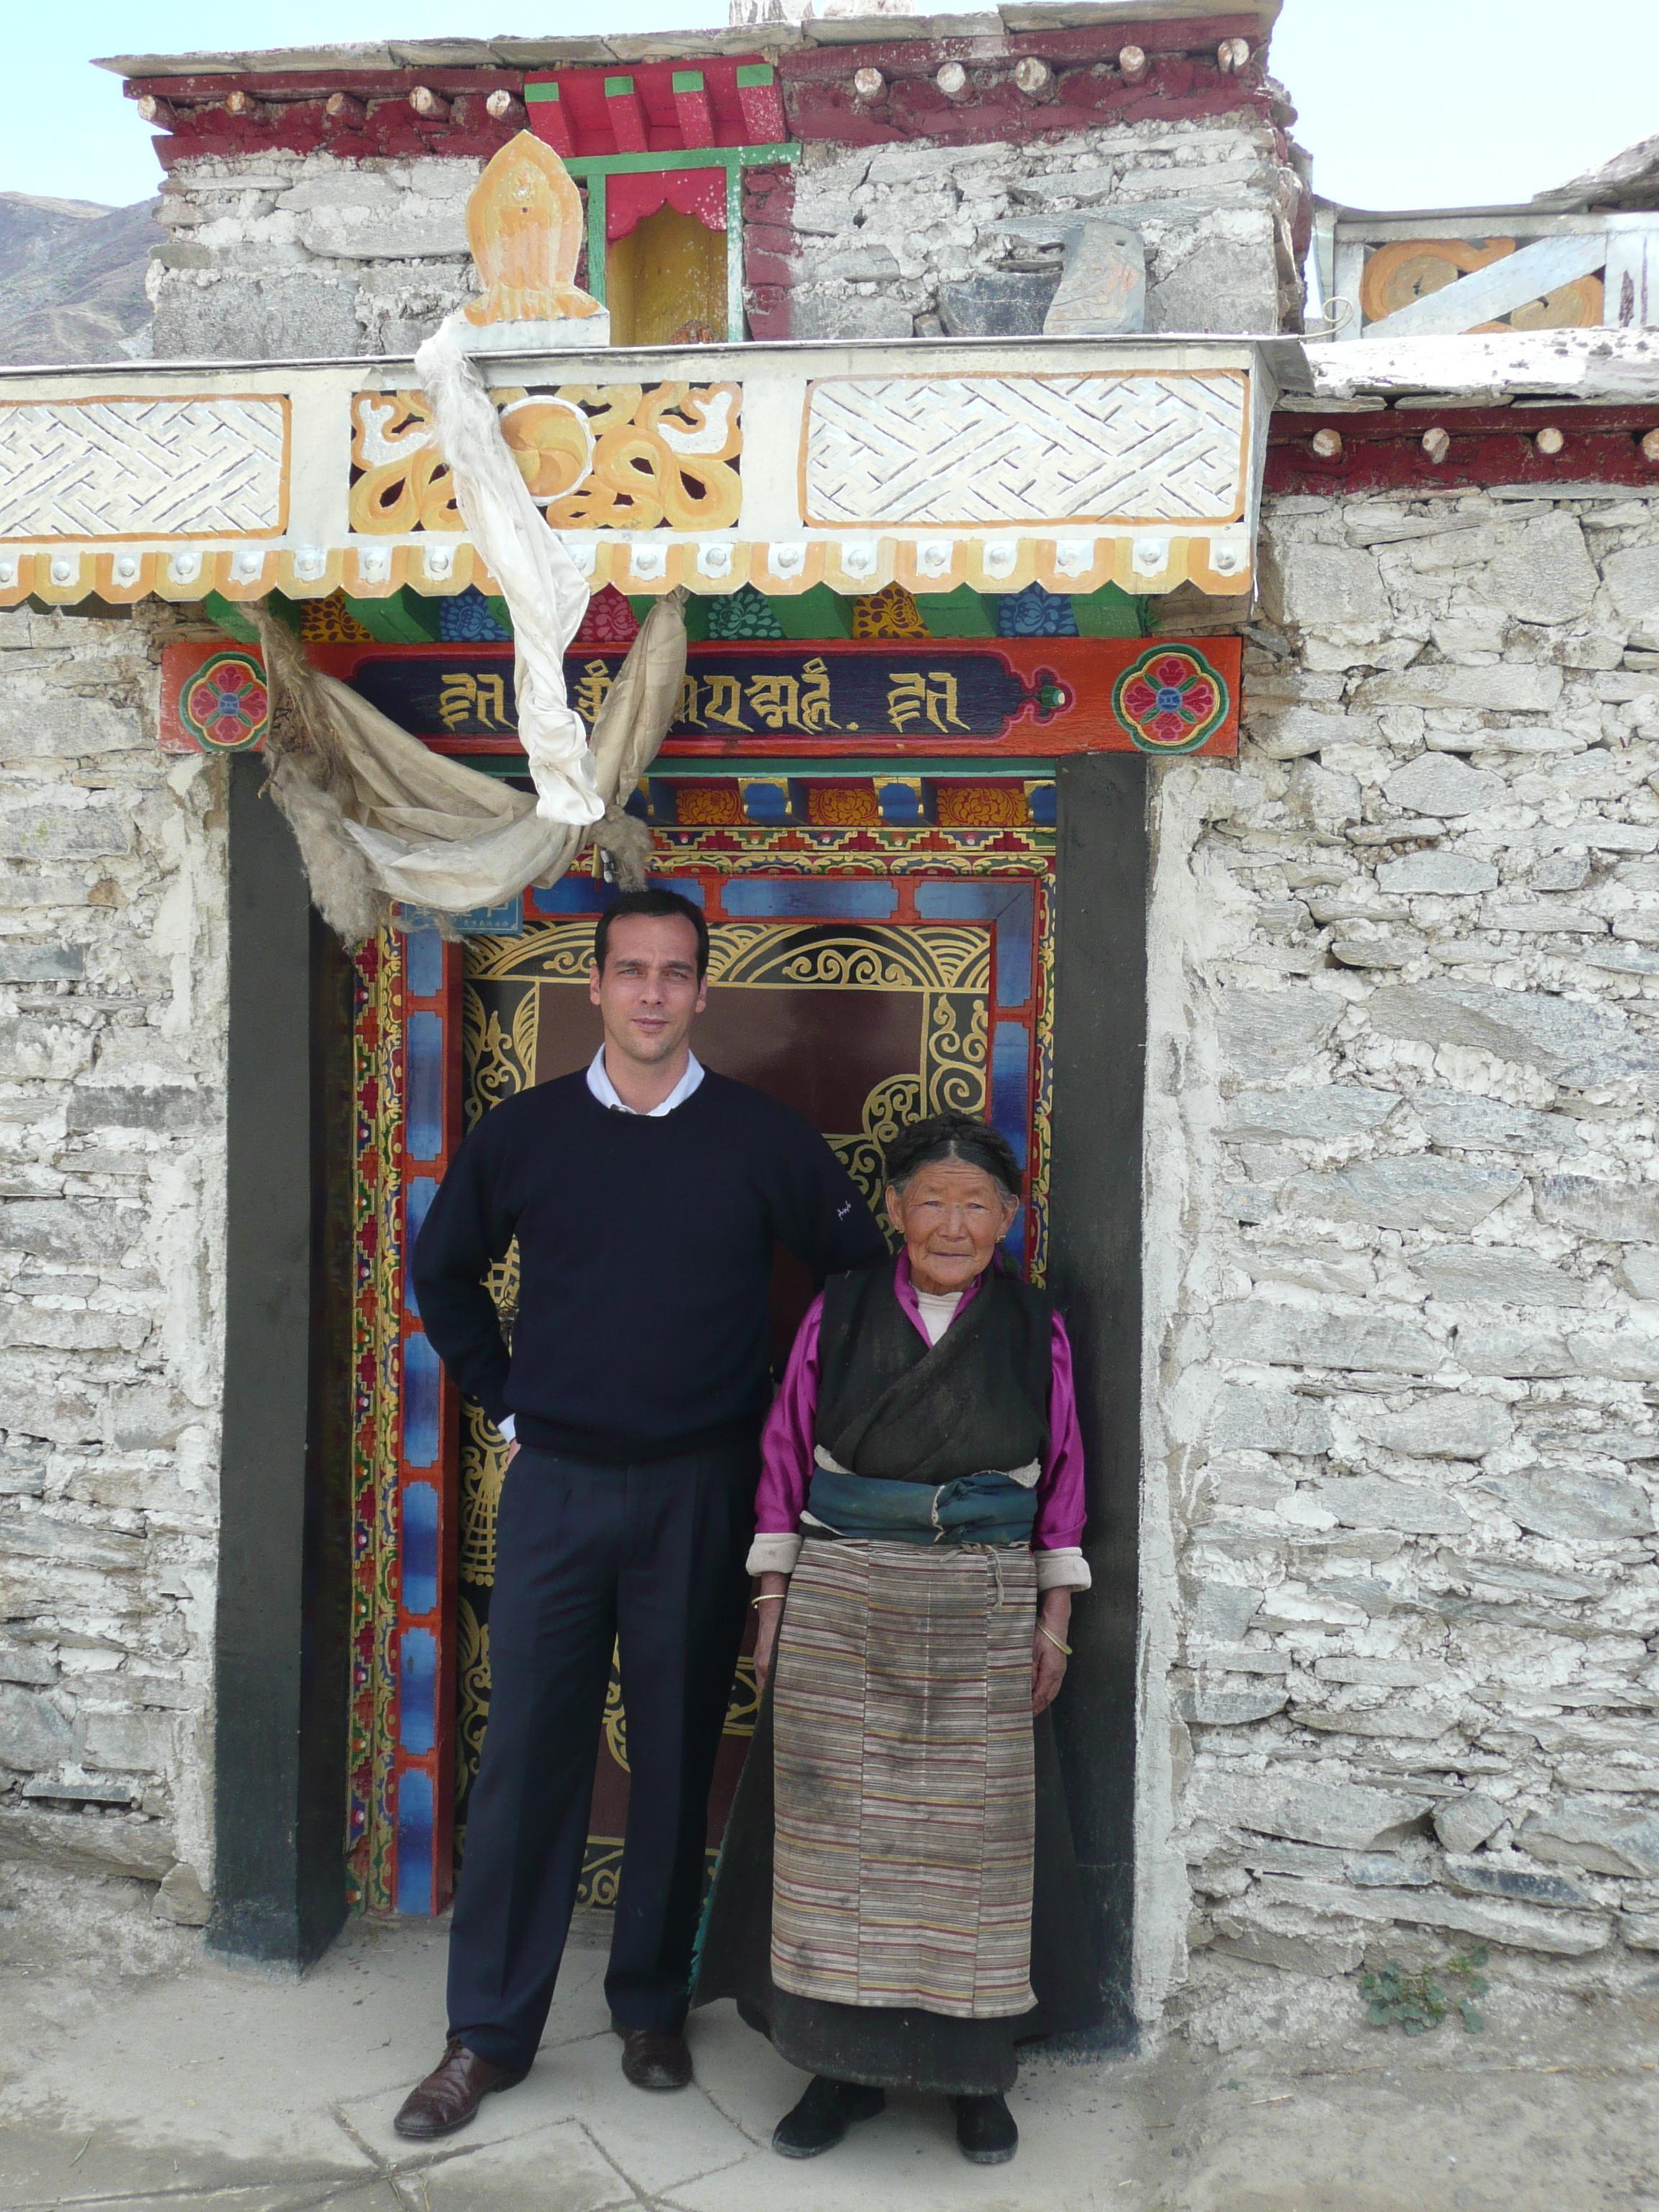 YAKS IN TIBET: Reinsuring semi-nomadic livestock in Tibet   Read more →